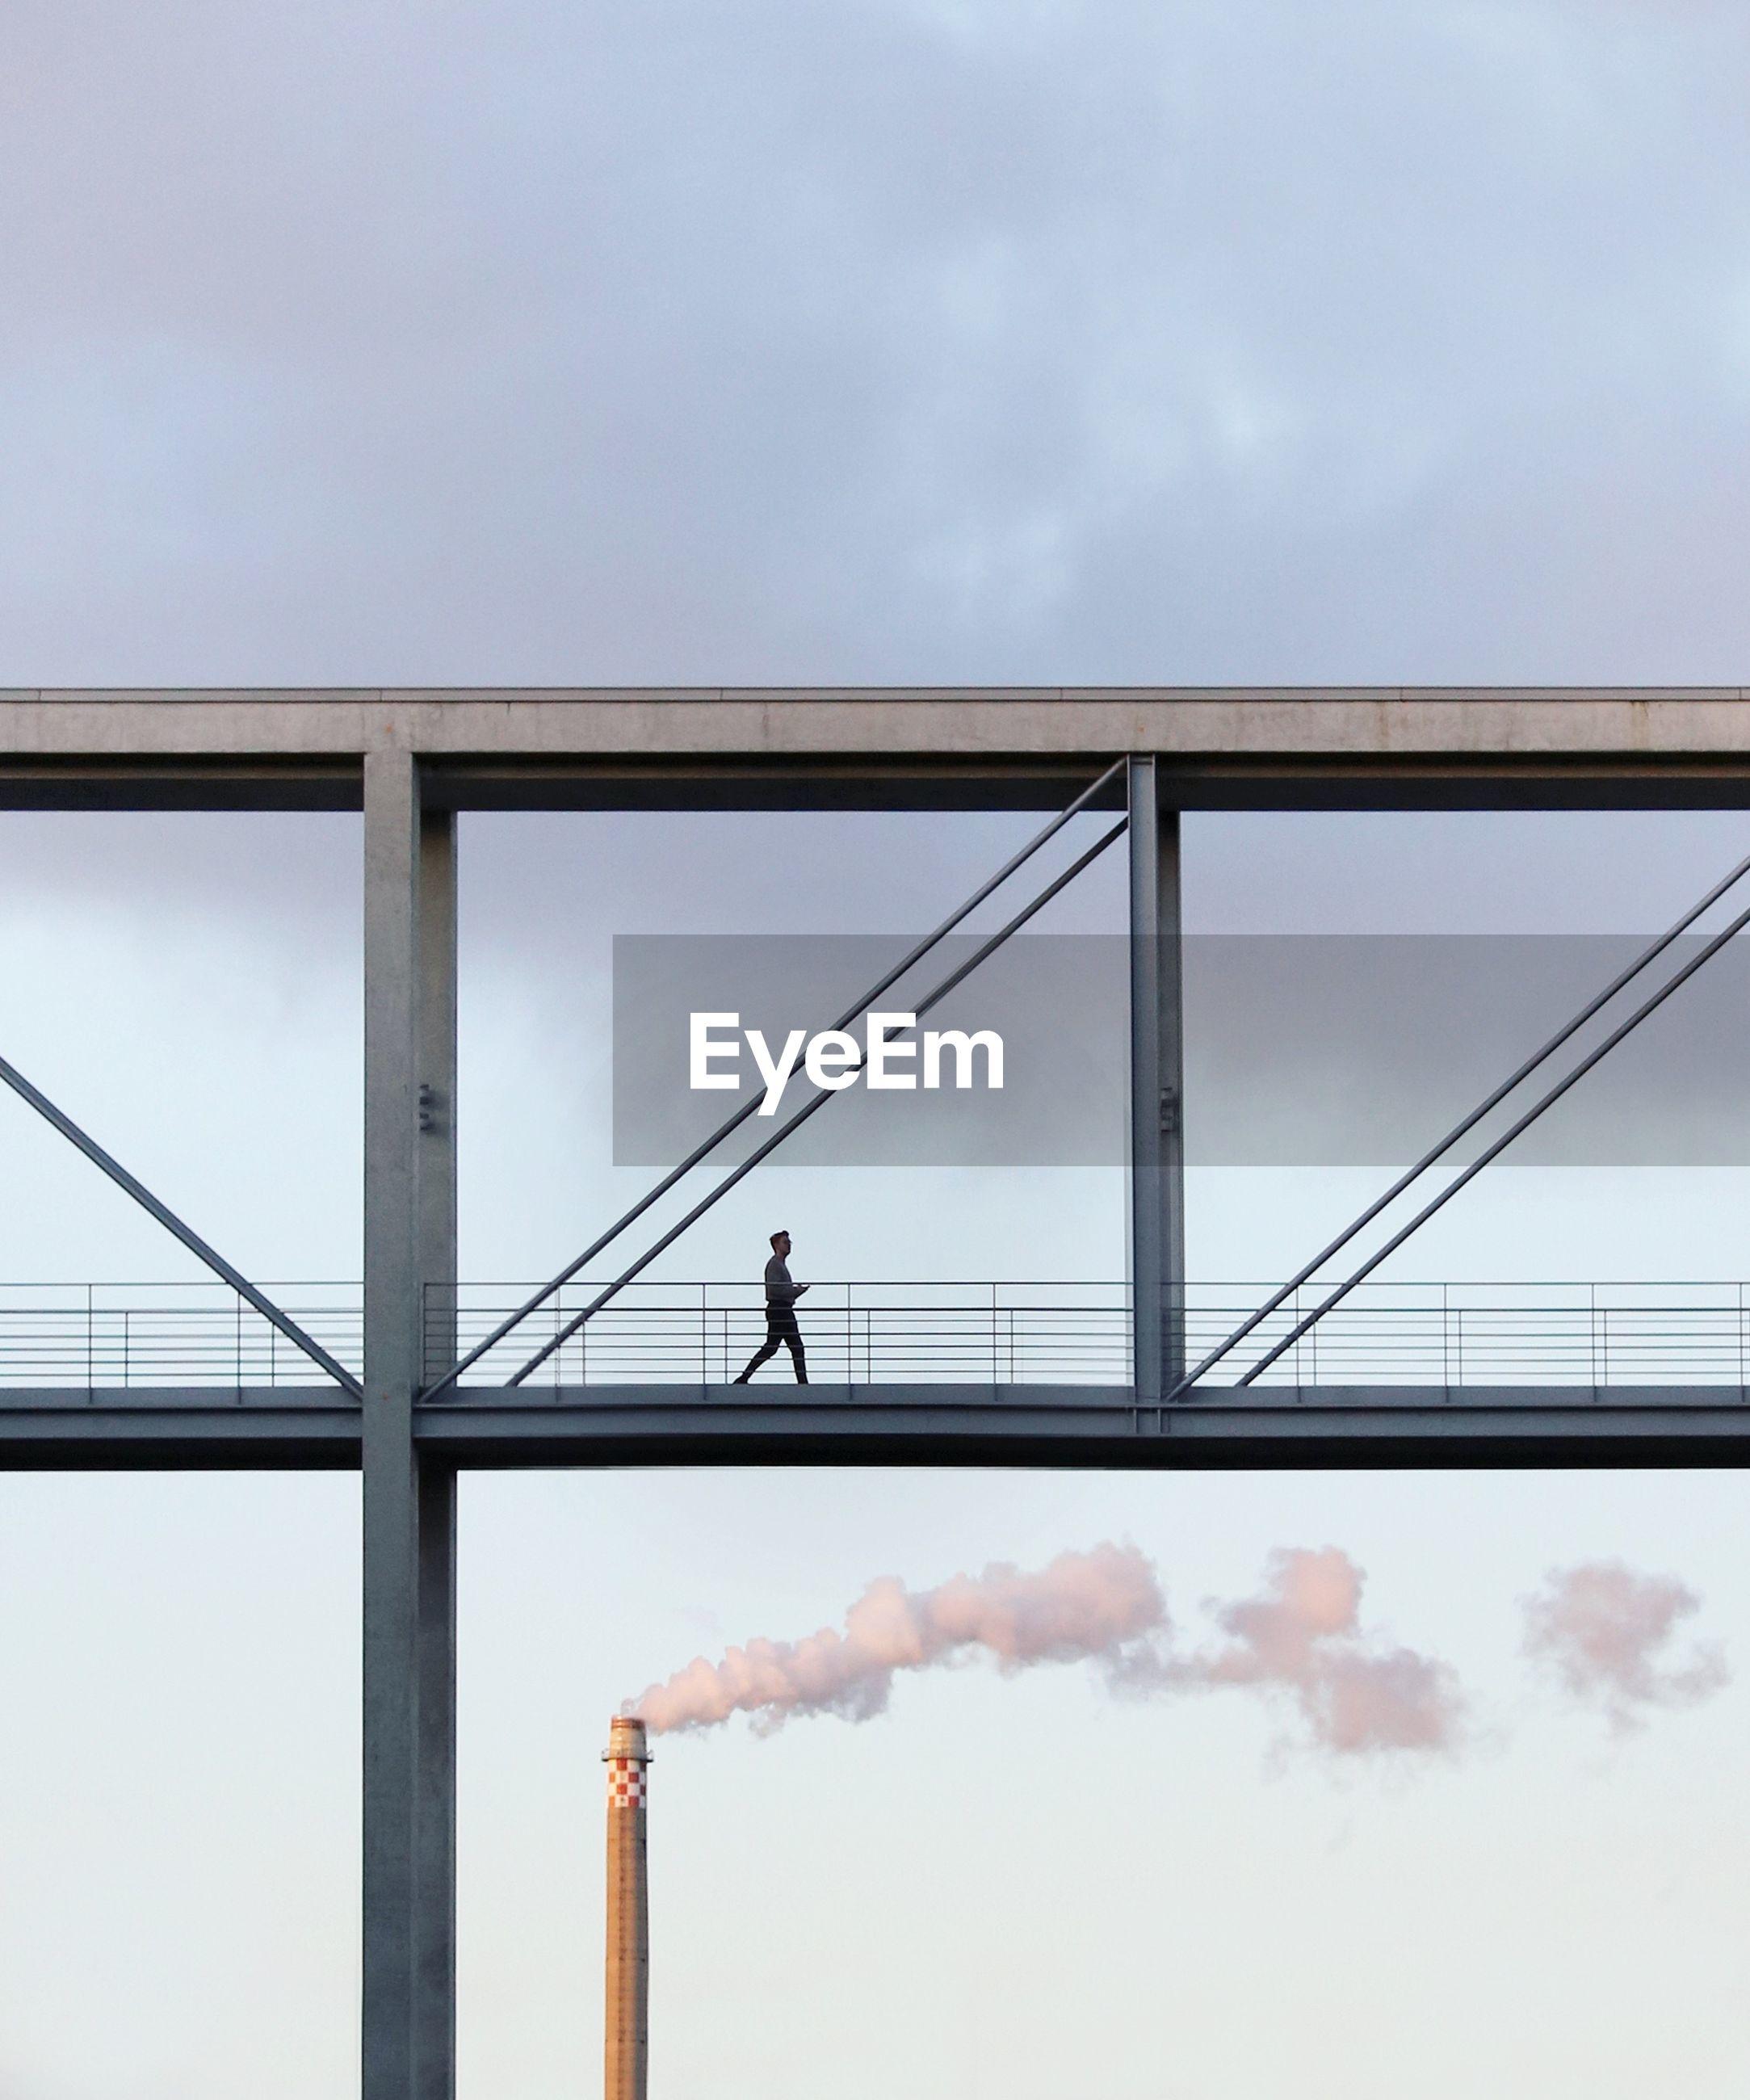 Low angle view of man walking on bridge